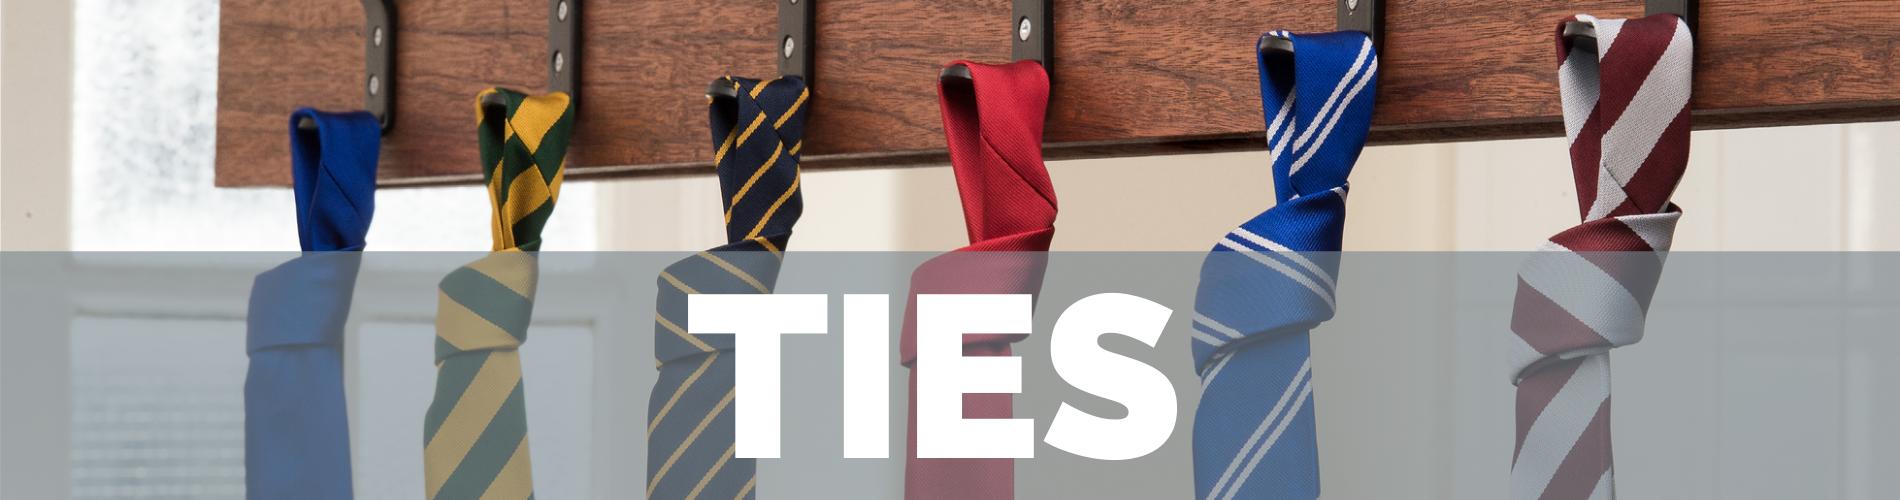 Ties banner images showing School Trends Ties on hooks